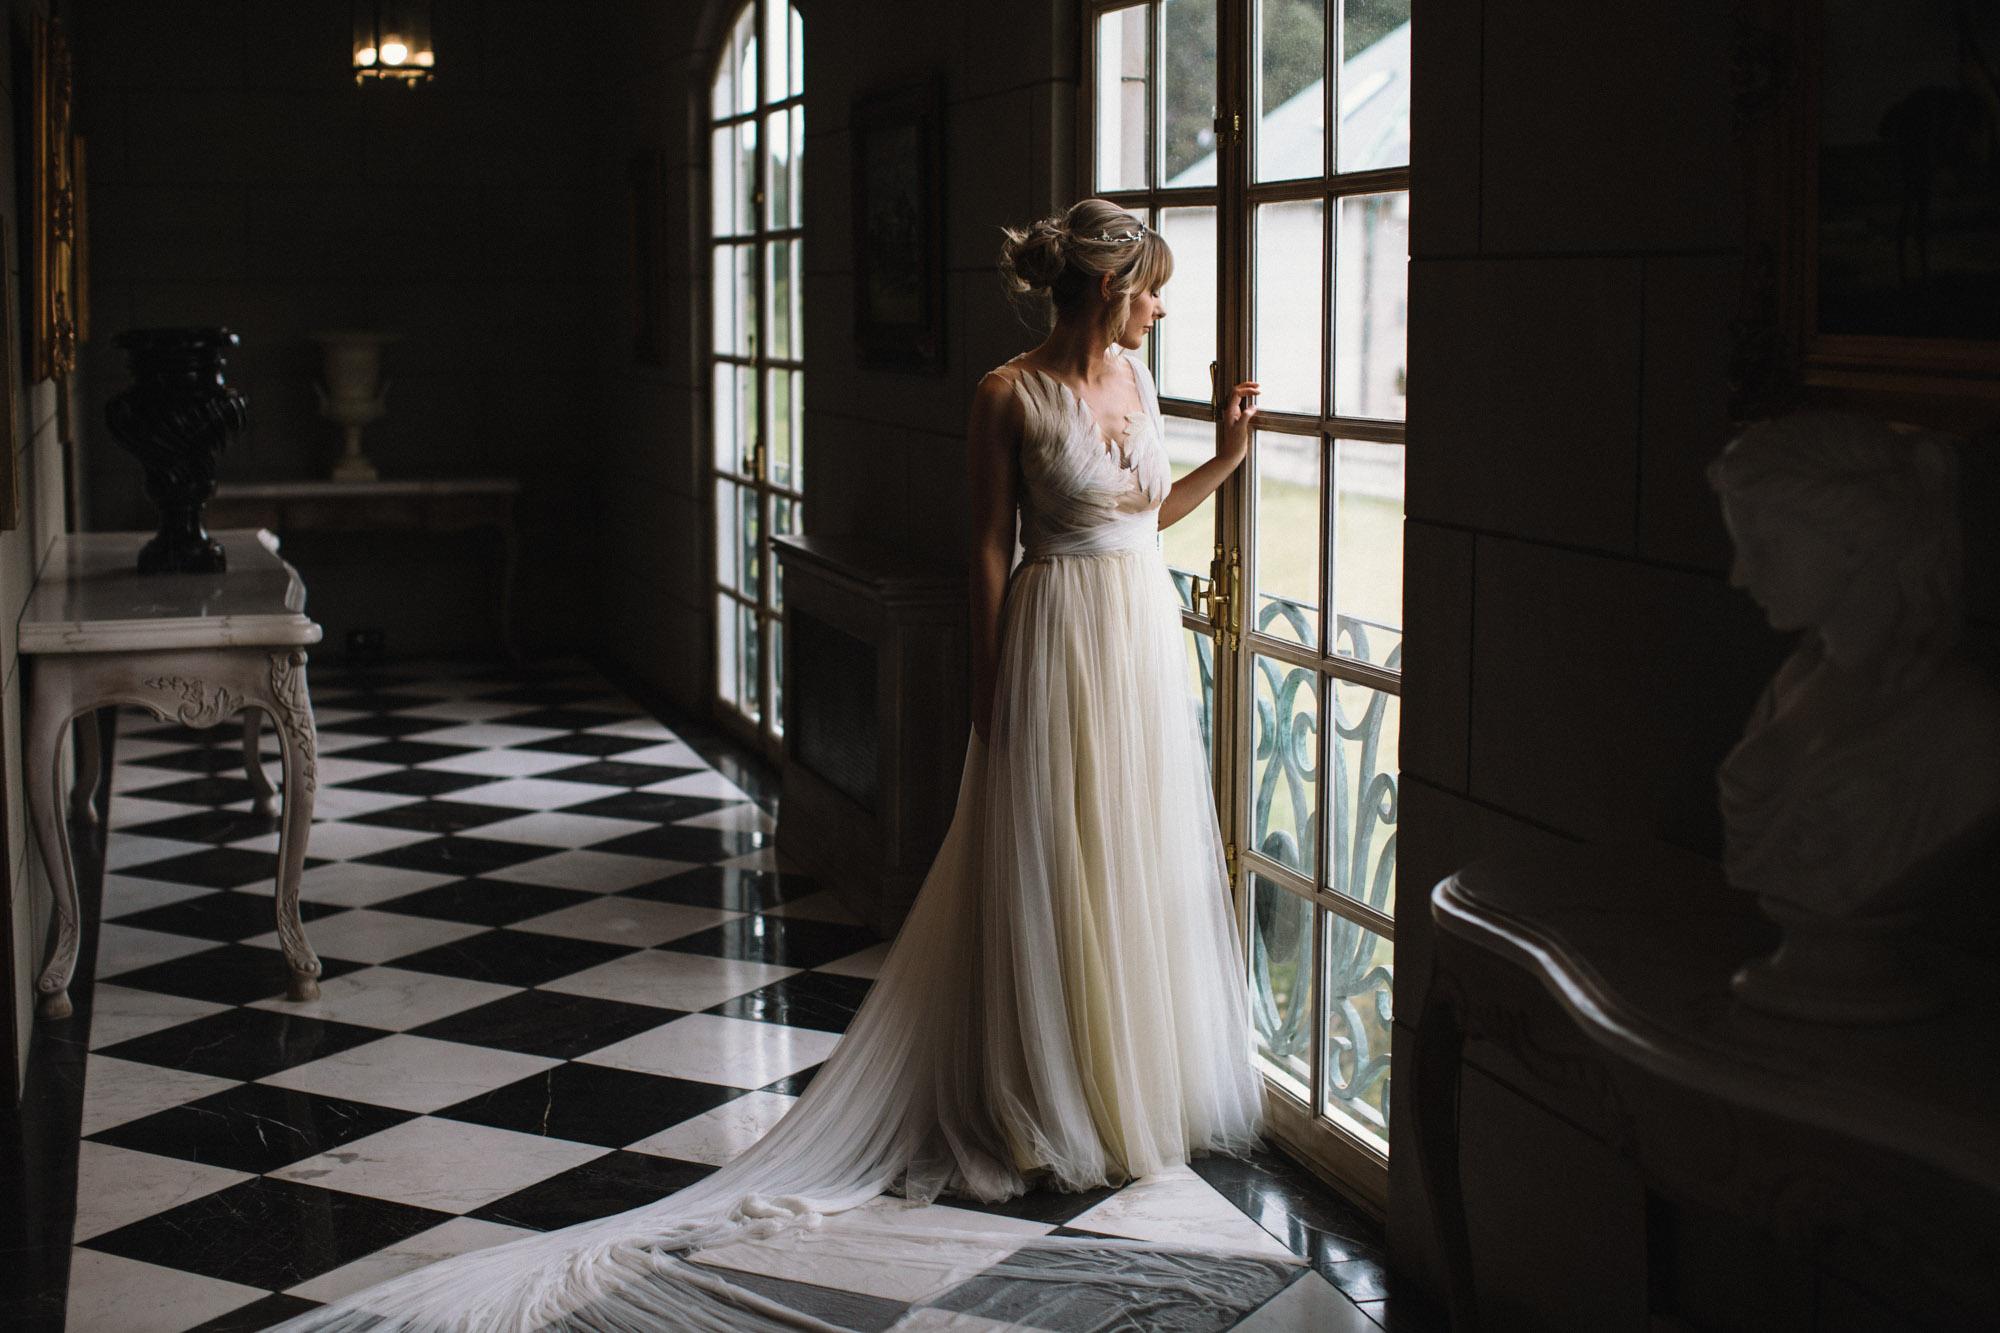 Campbell Point House Wedding HJ + Dean Raphael Weddings-115.jpg